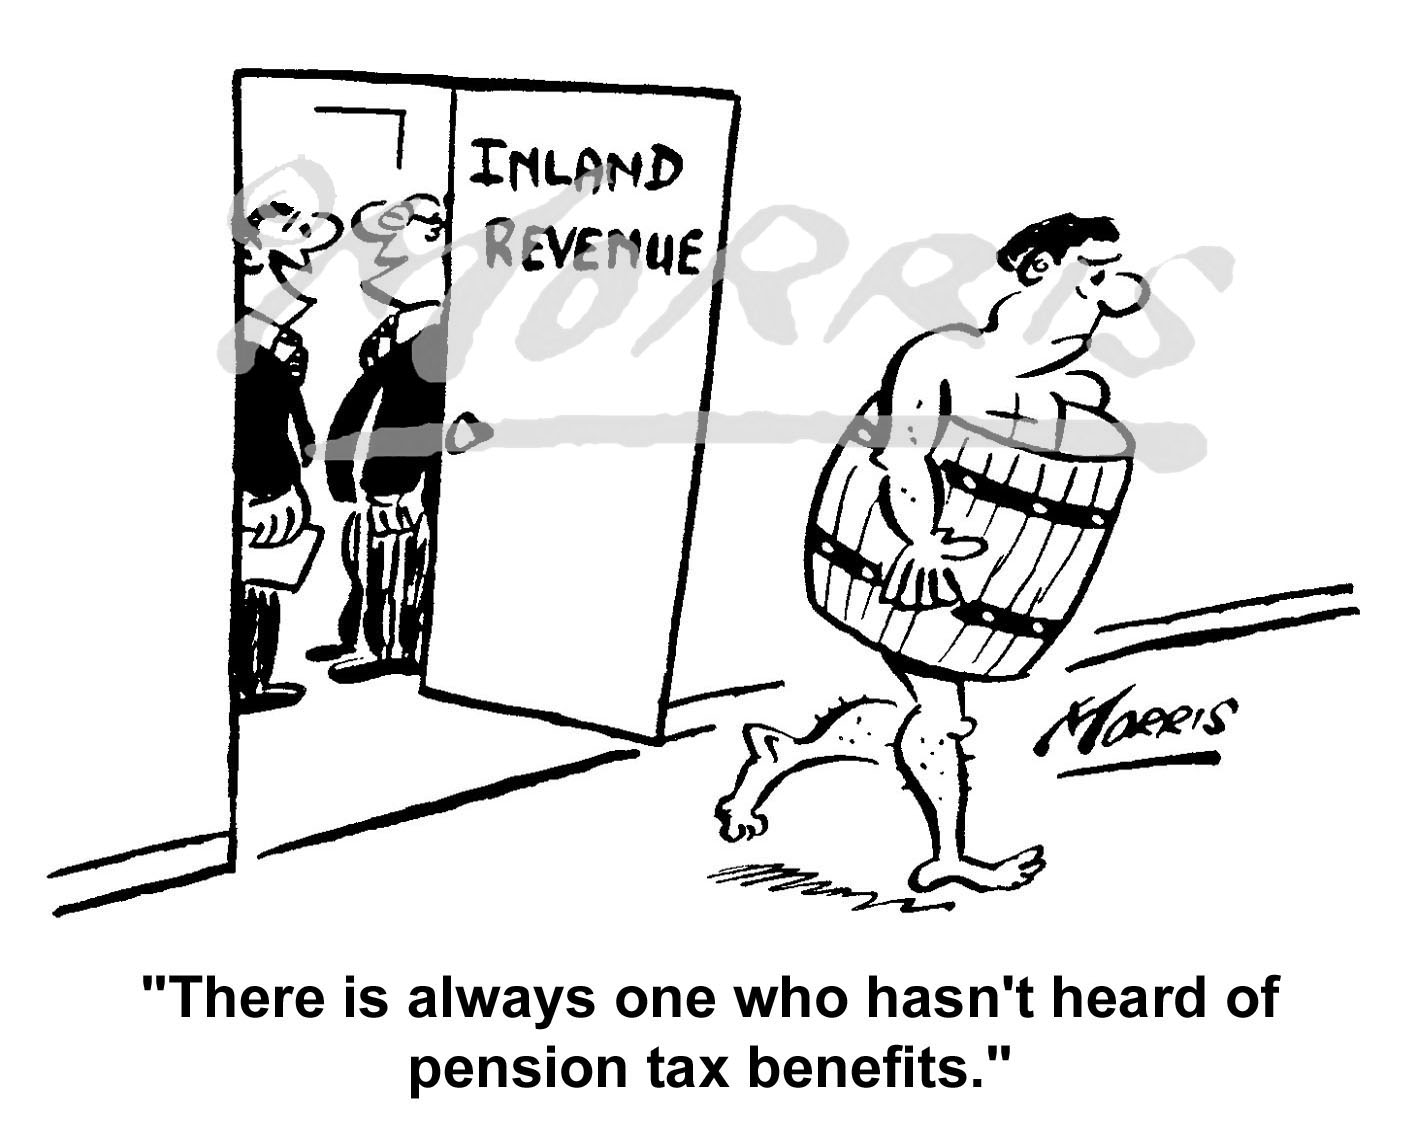 Pension tax benefits HMRC cartoon Ref: 0183bw